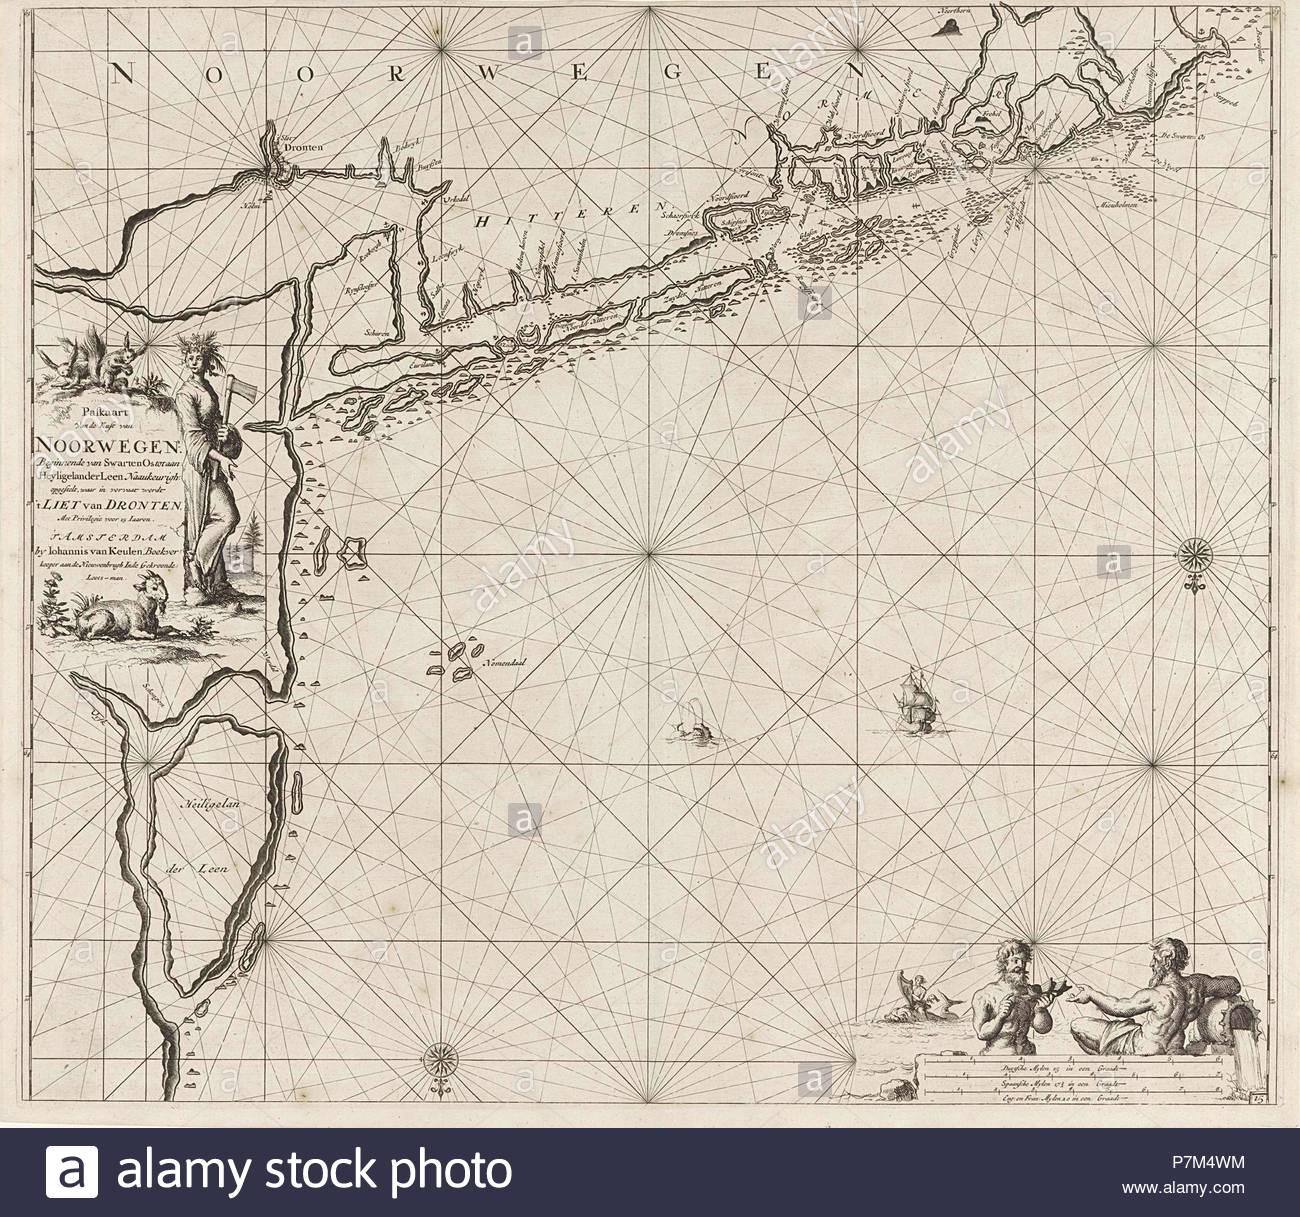 Sea chart of the coast of Norway near Trondheim, Jan Luyken, Johannes van Keulen (I), unknown, 1681 - 1799. - Stock Image